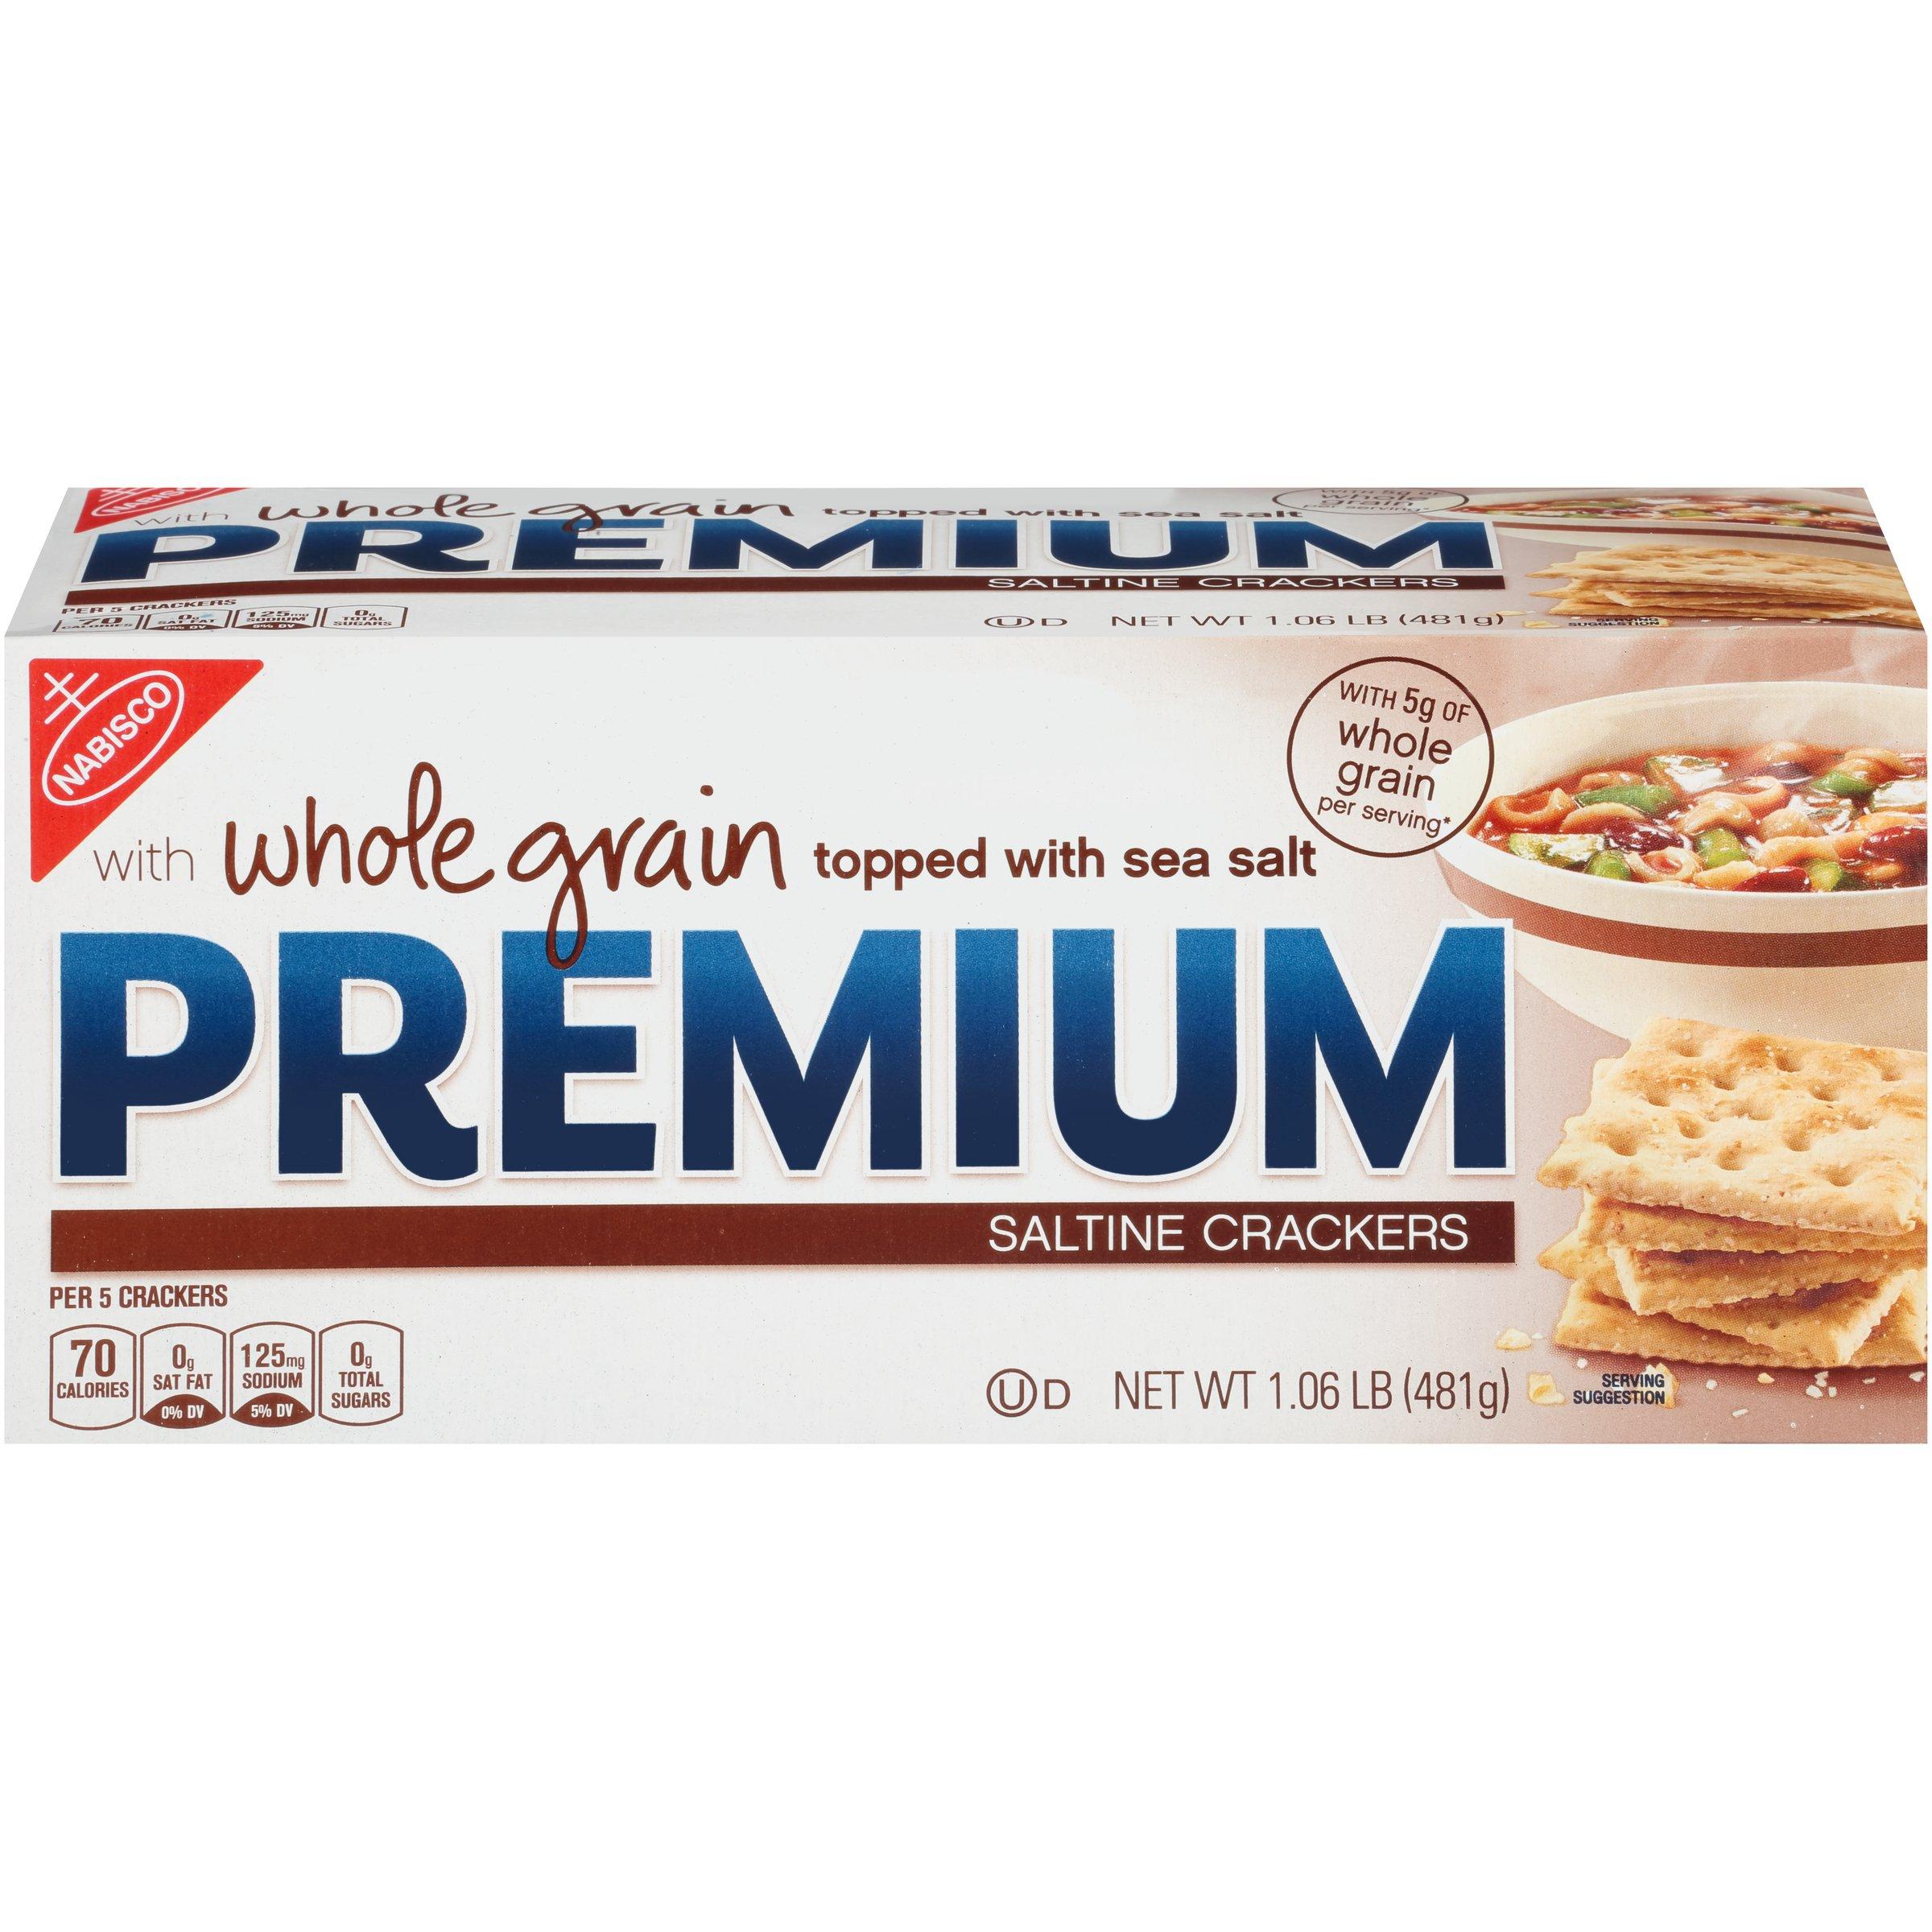 Premium Saltine Crackers, Whole Grain, 16.96 oz (Pack of 12) by PREMIUM